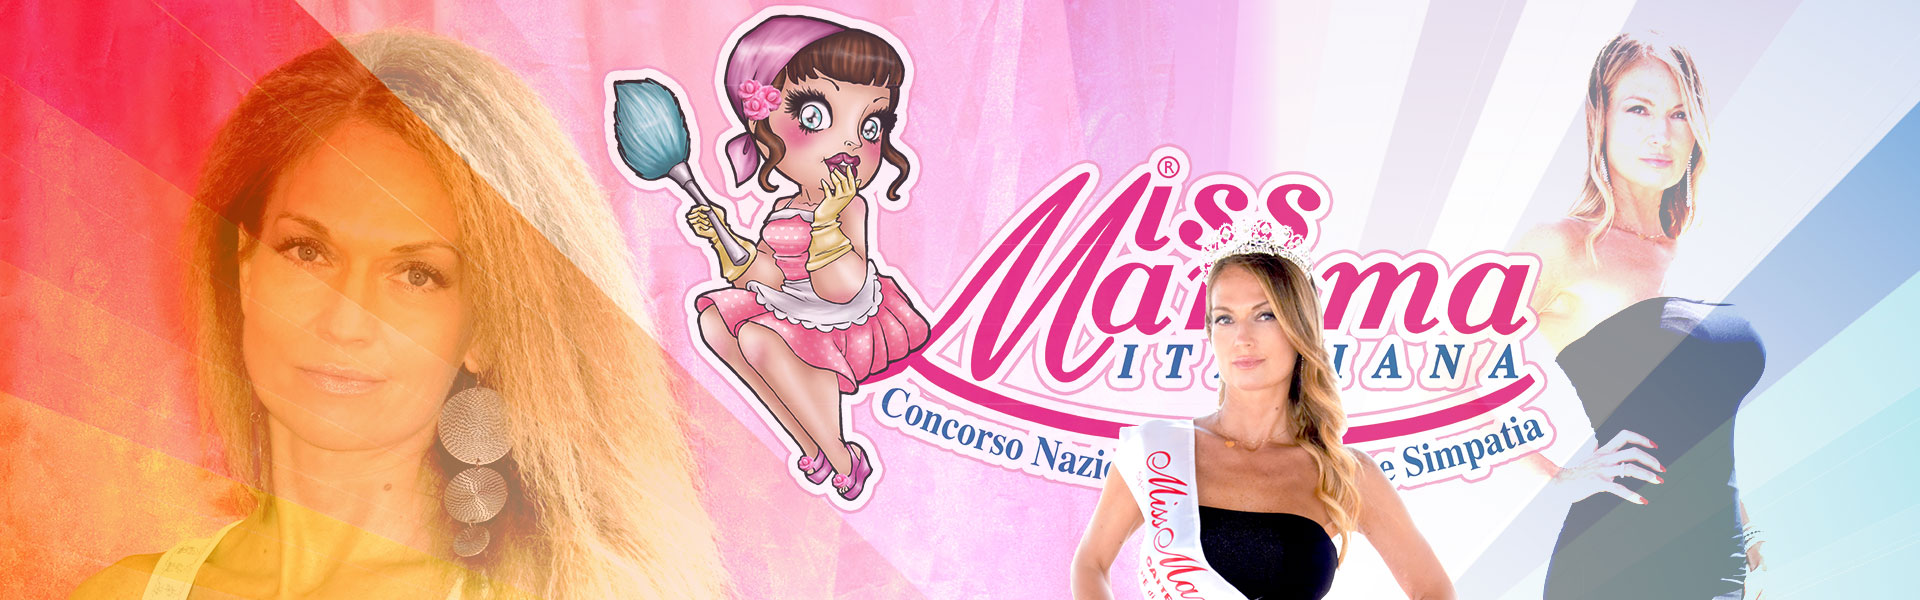 Miss-Mamma-Italiana-2019-Emanuela-Bonomin-per-slide-home-2